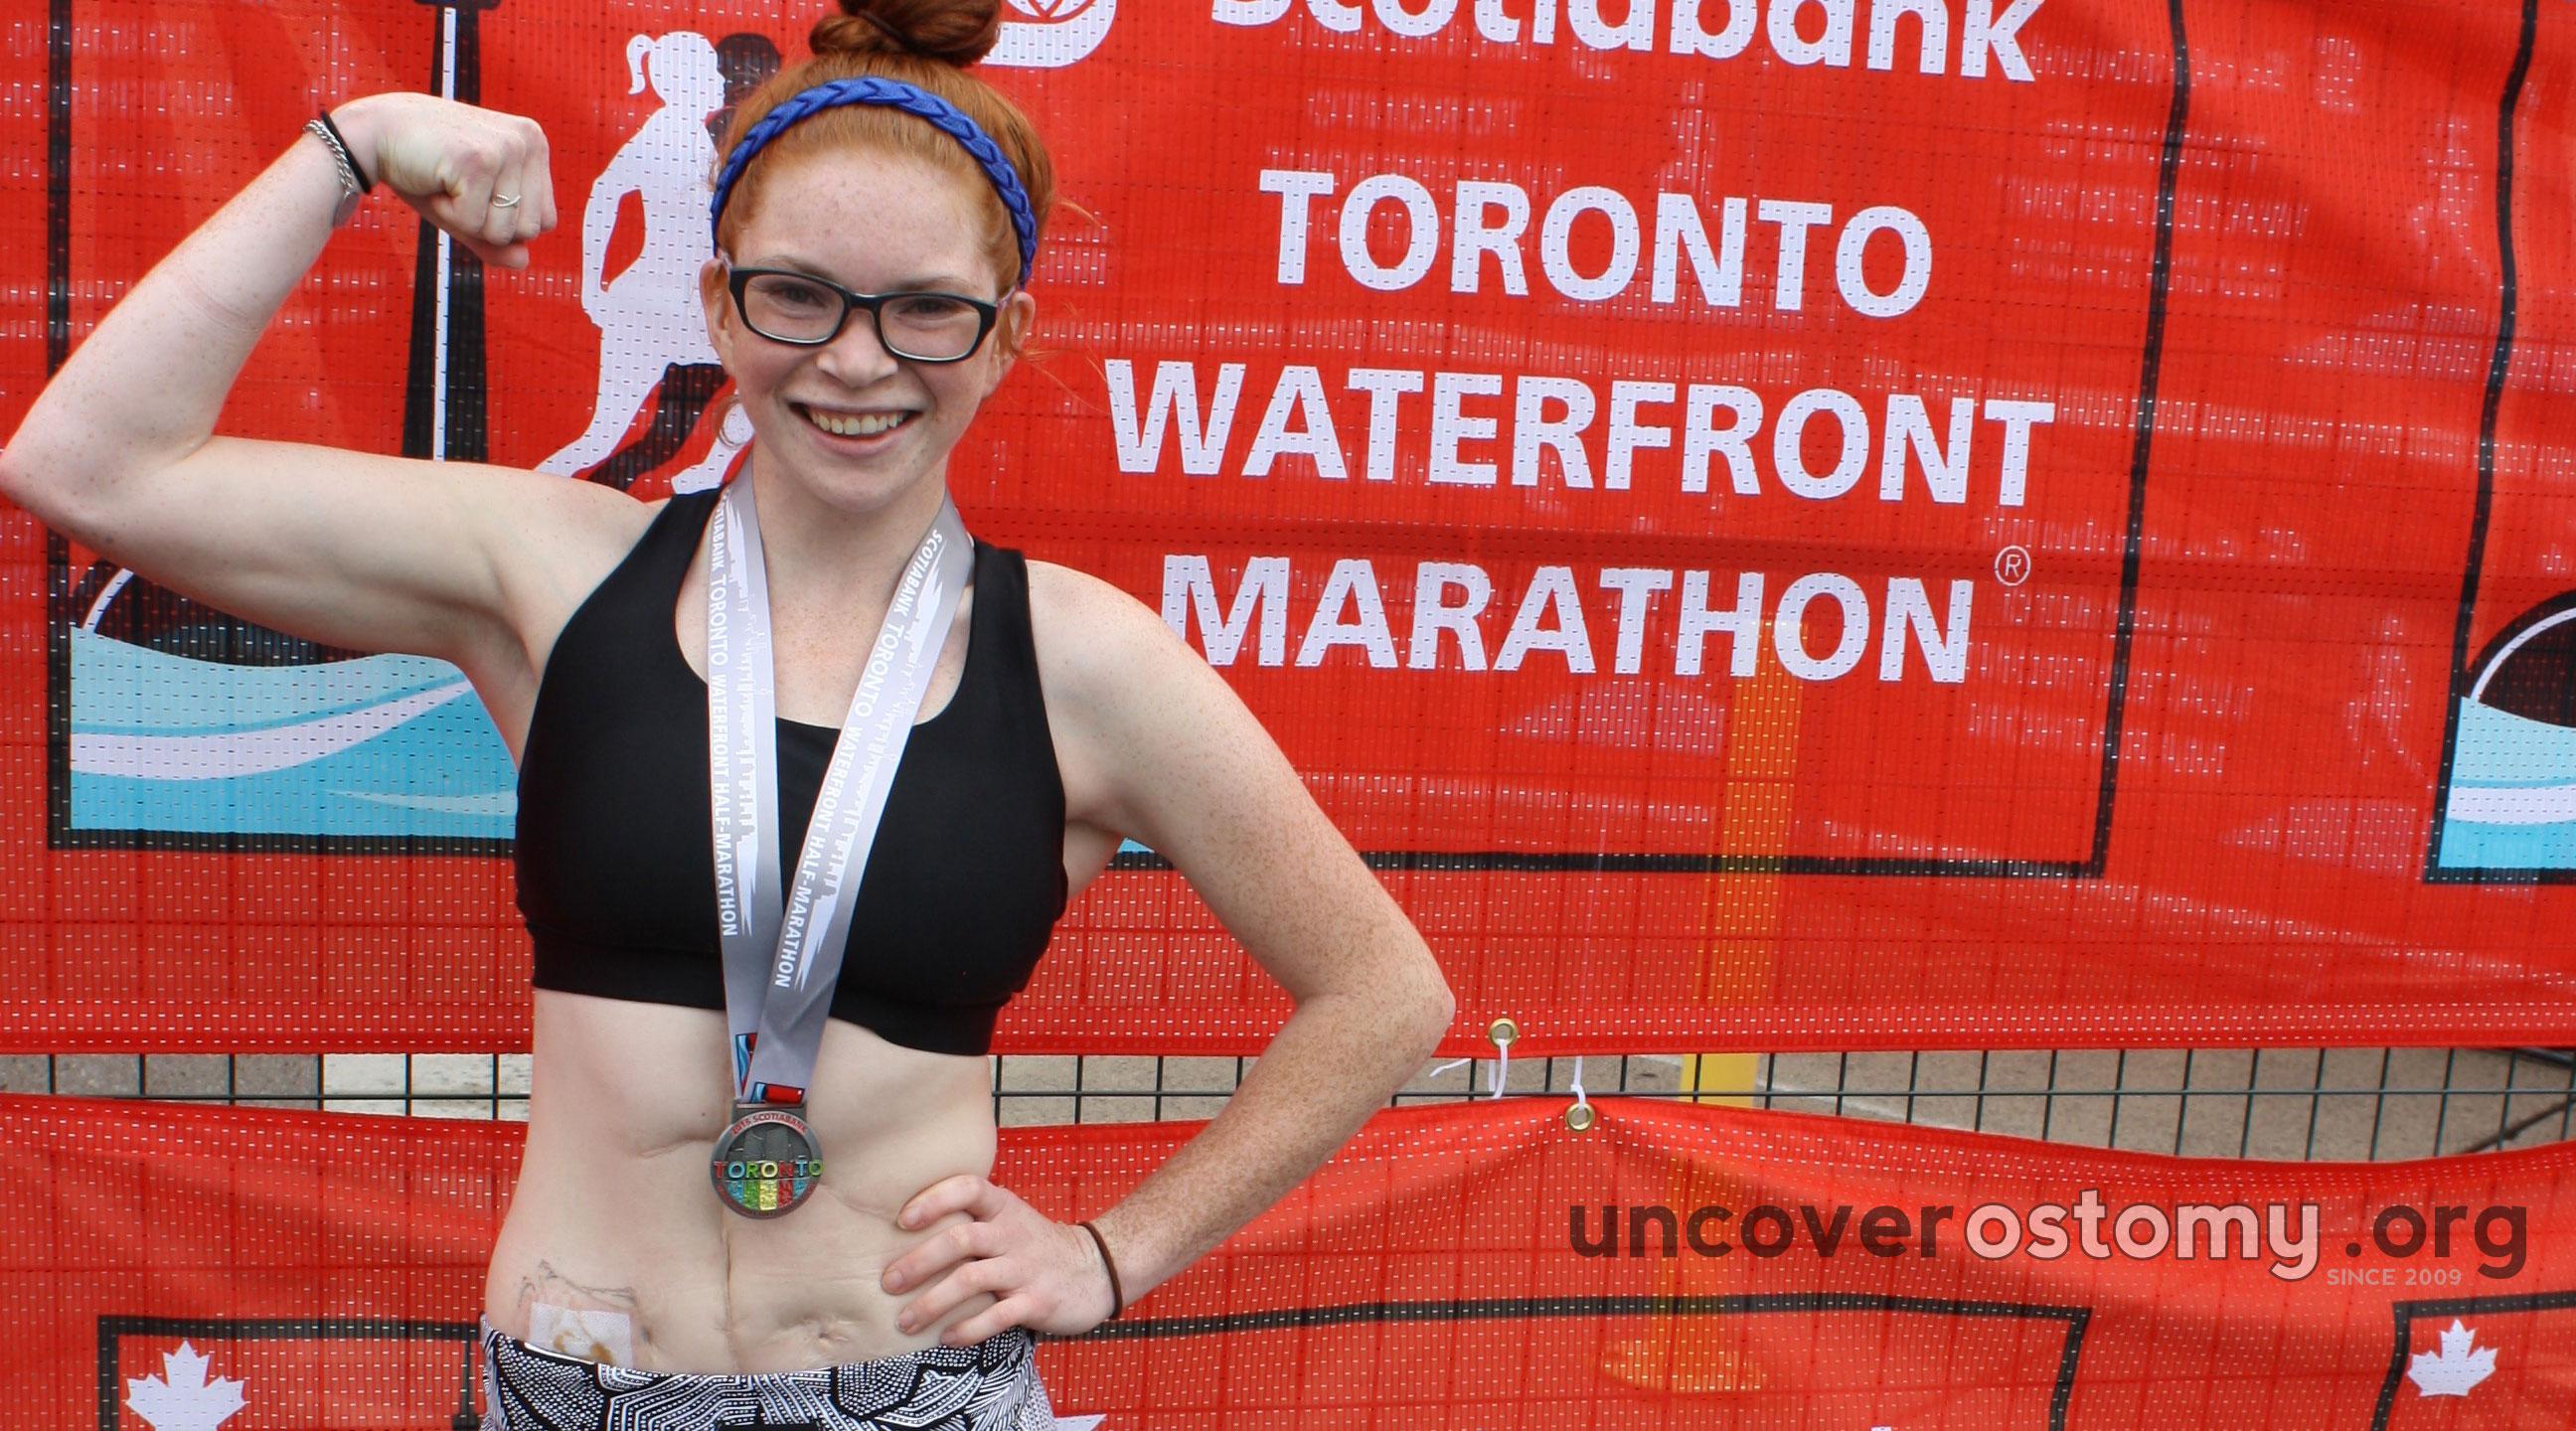 kaitlyn-uncover ostomy toronto marathon